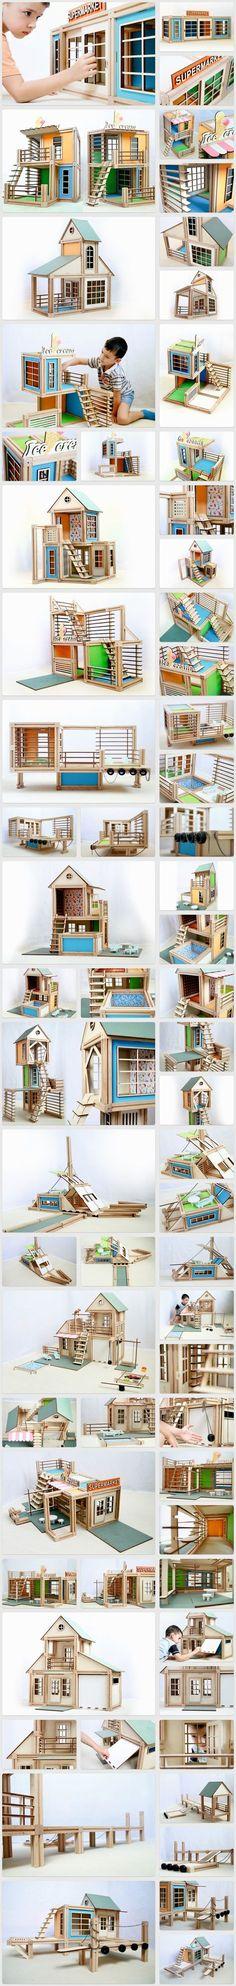 WoodyMac - Magnetic Building Blocks by WoodyMac, Inc. — Kickstarter